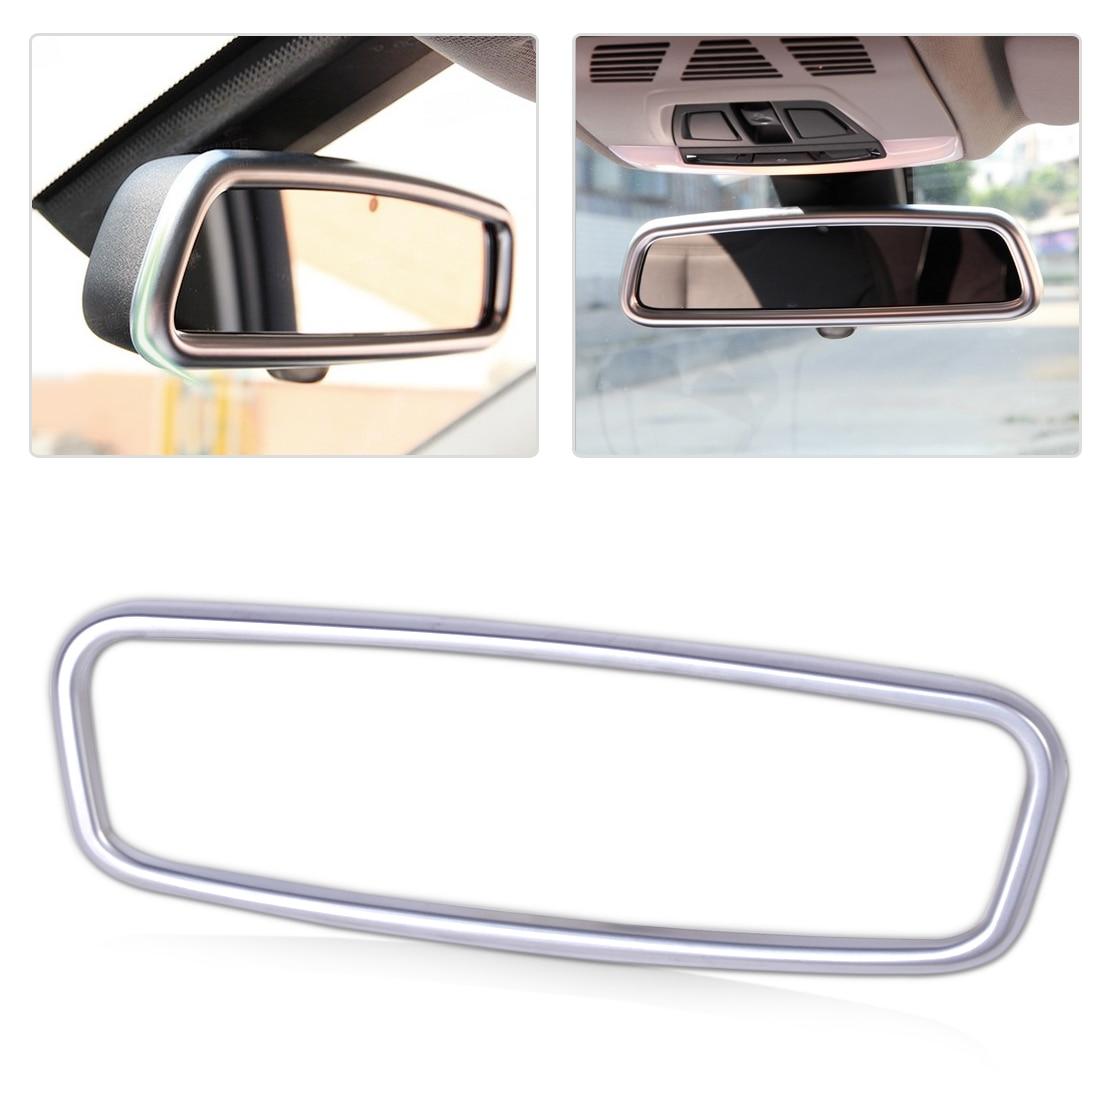 beler ABS Chrome Interior Rearview Mirror Frame Trim for Mercedes Benz A CLA GLA Class W176